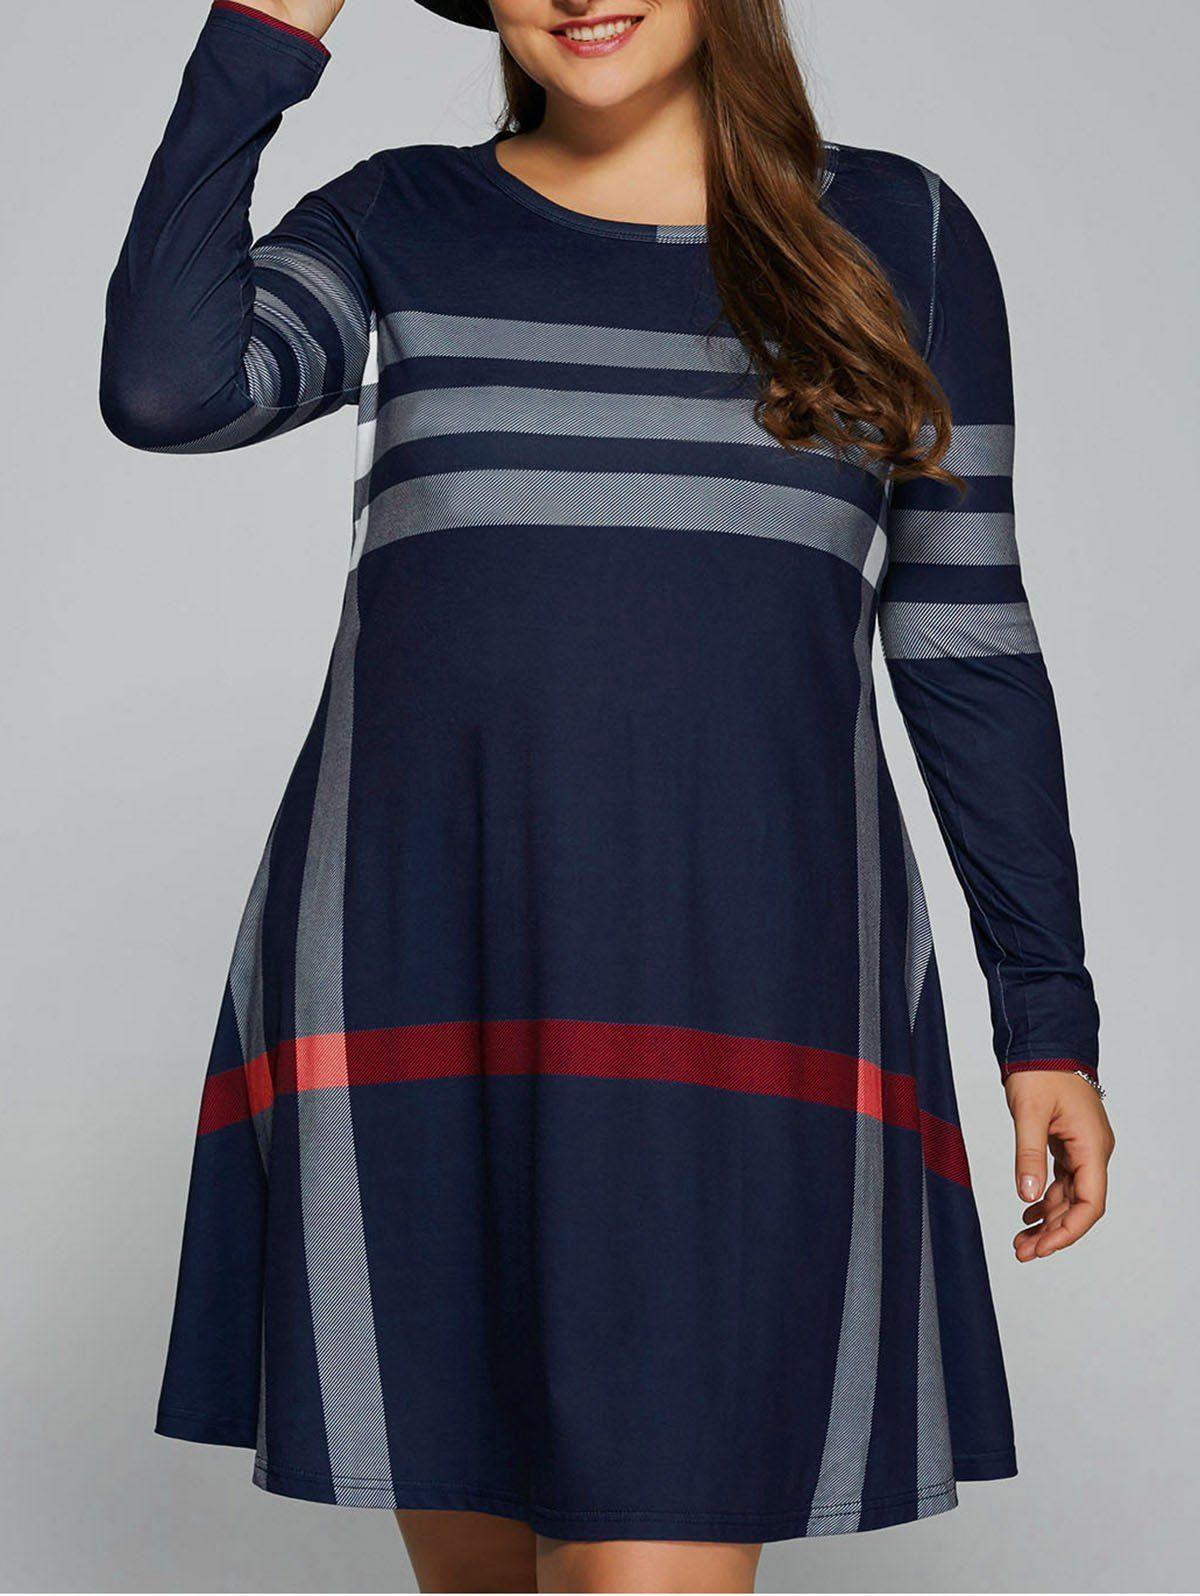 275dbd0320 Vertical Striped Comfy T-Shirt Dress in Purplish Blue